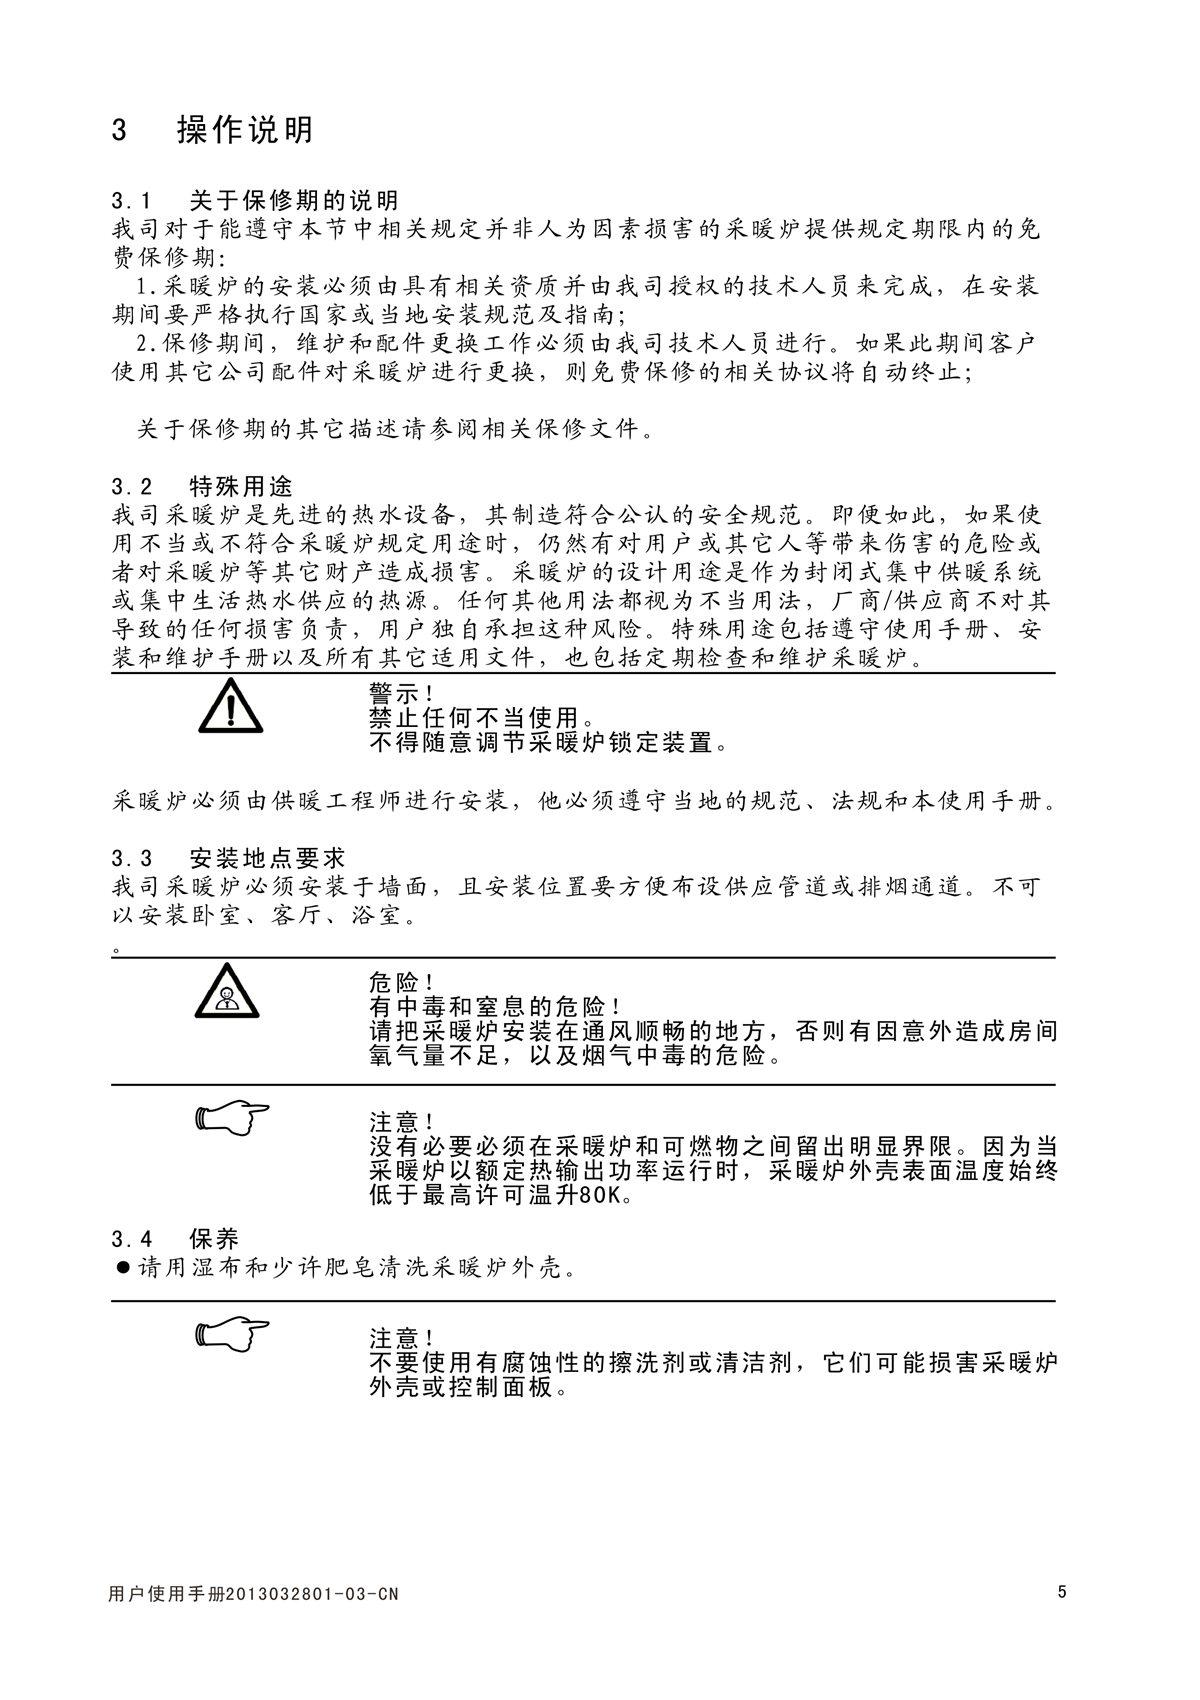 ES03系列-用户使用手册-6_03.jpg